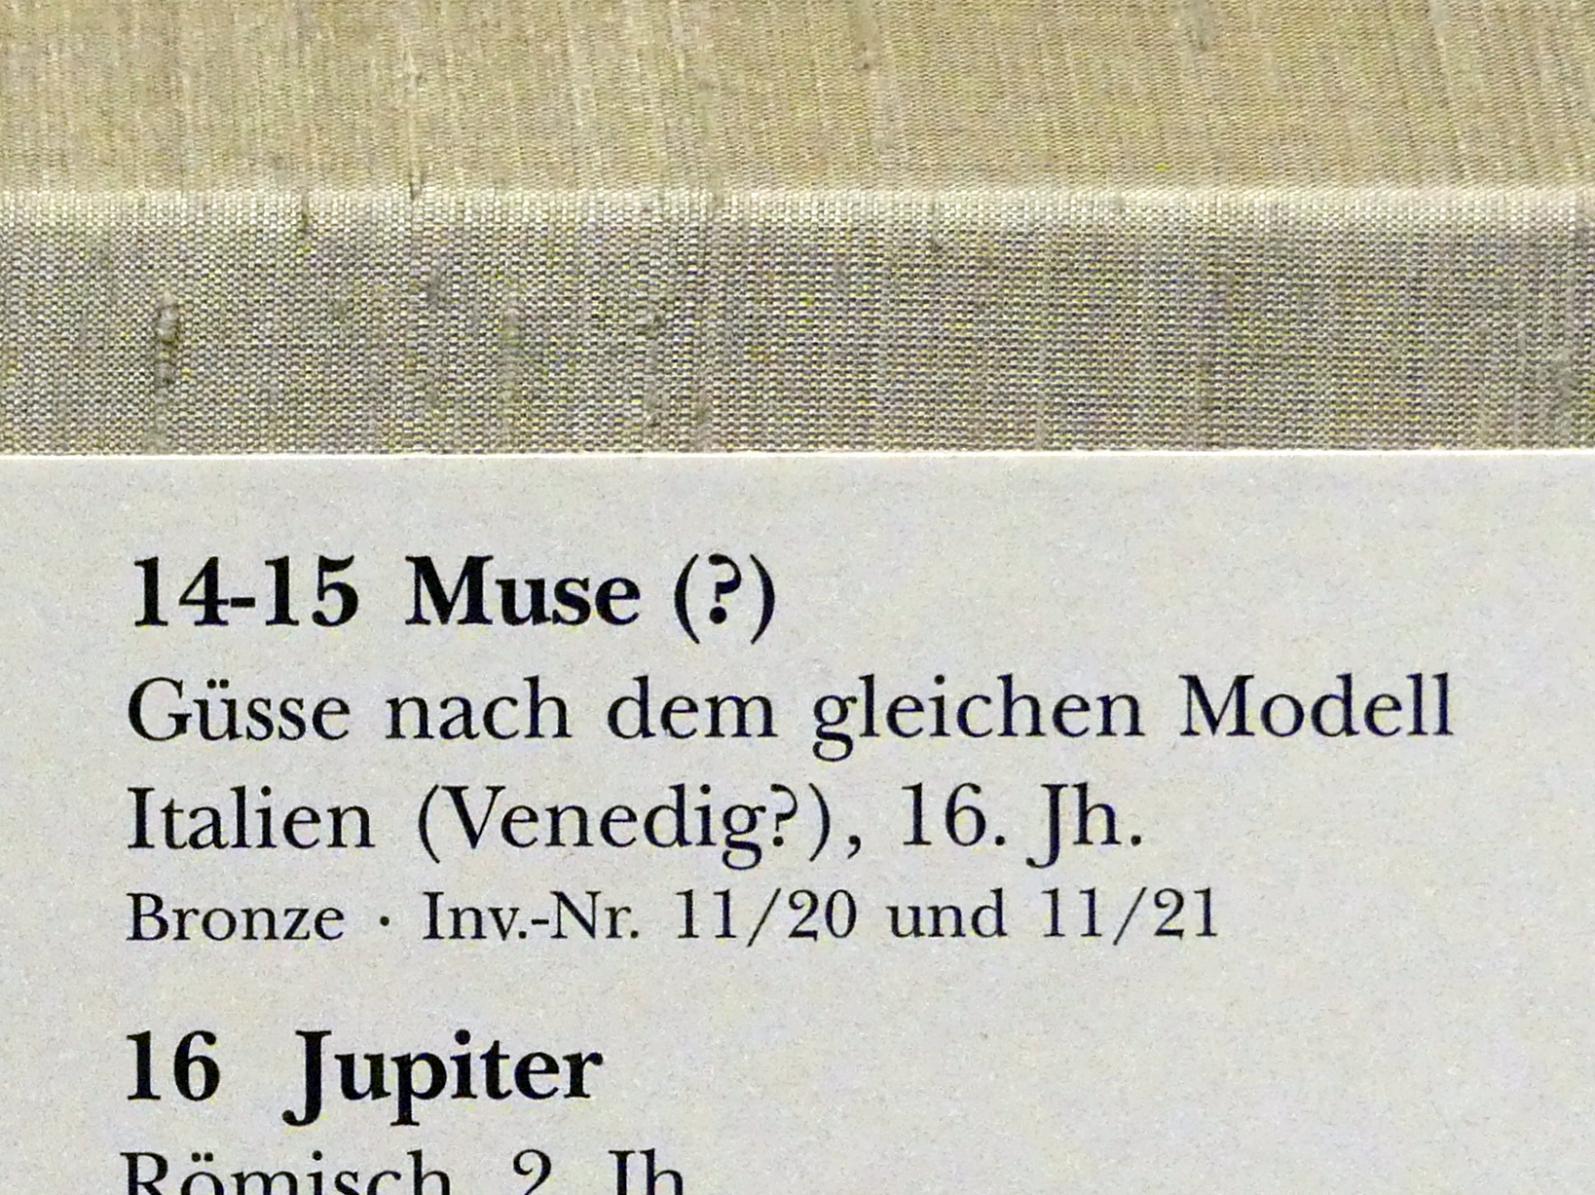 Muse (?), 16. Jhd., Bild 2/2